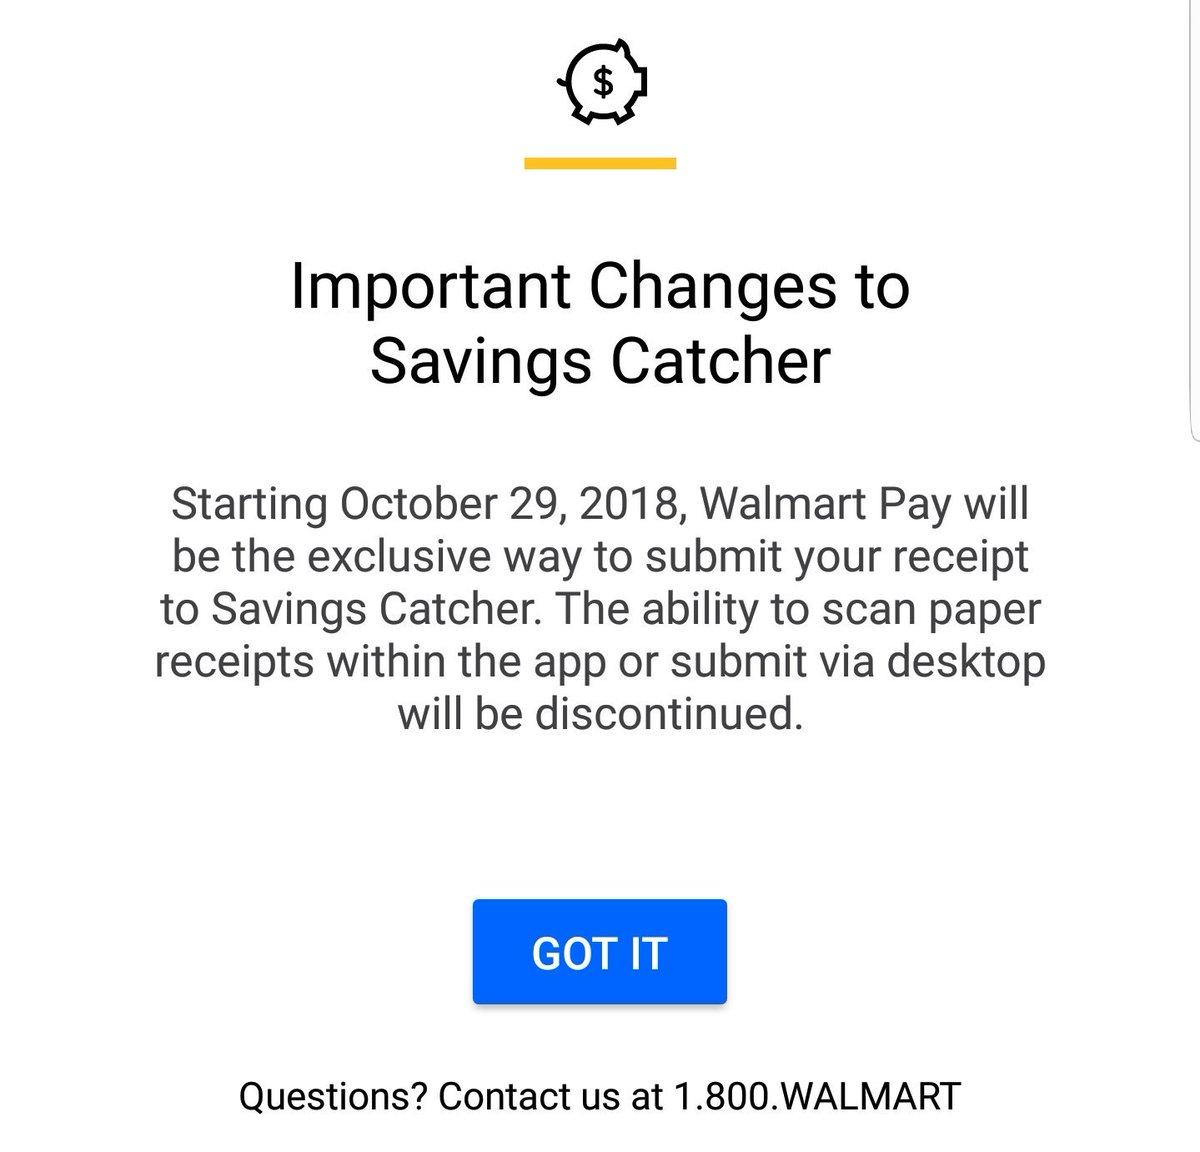 Savingscatcher Hashtag On Twitter Wiring Money From Walmart 0 Replies Retweets Likes